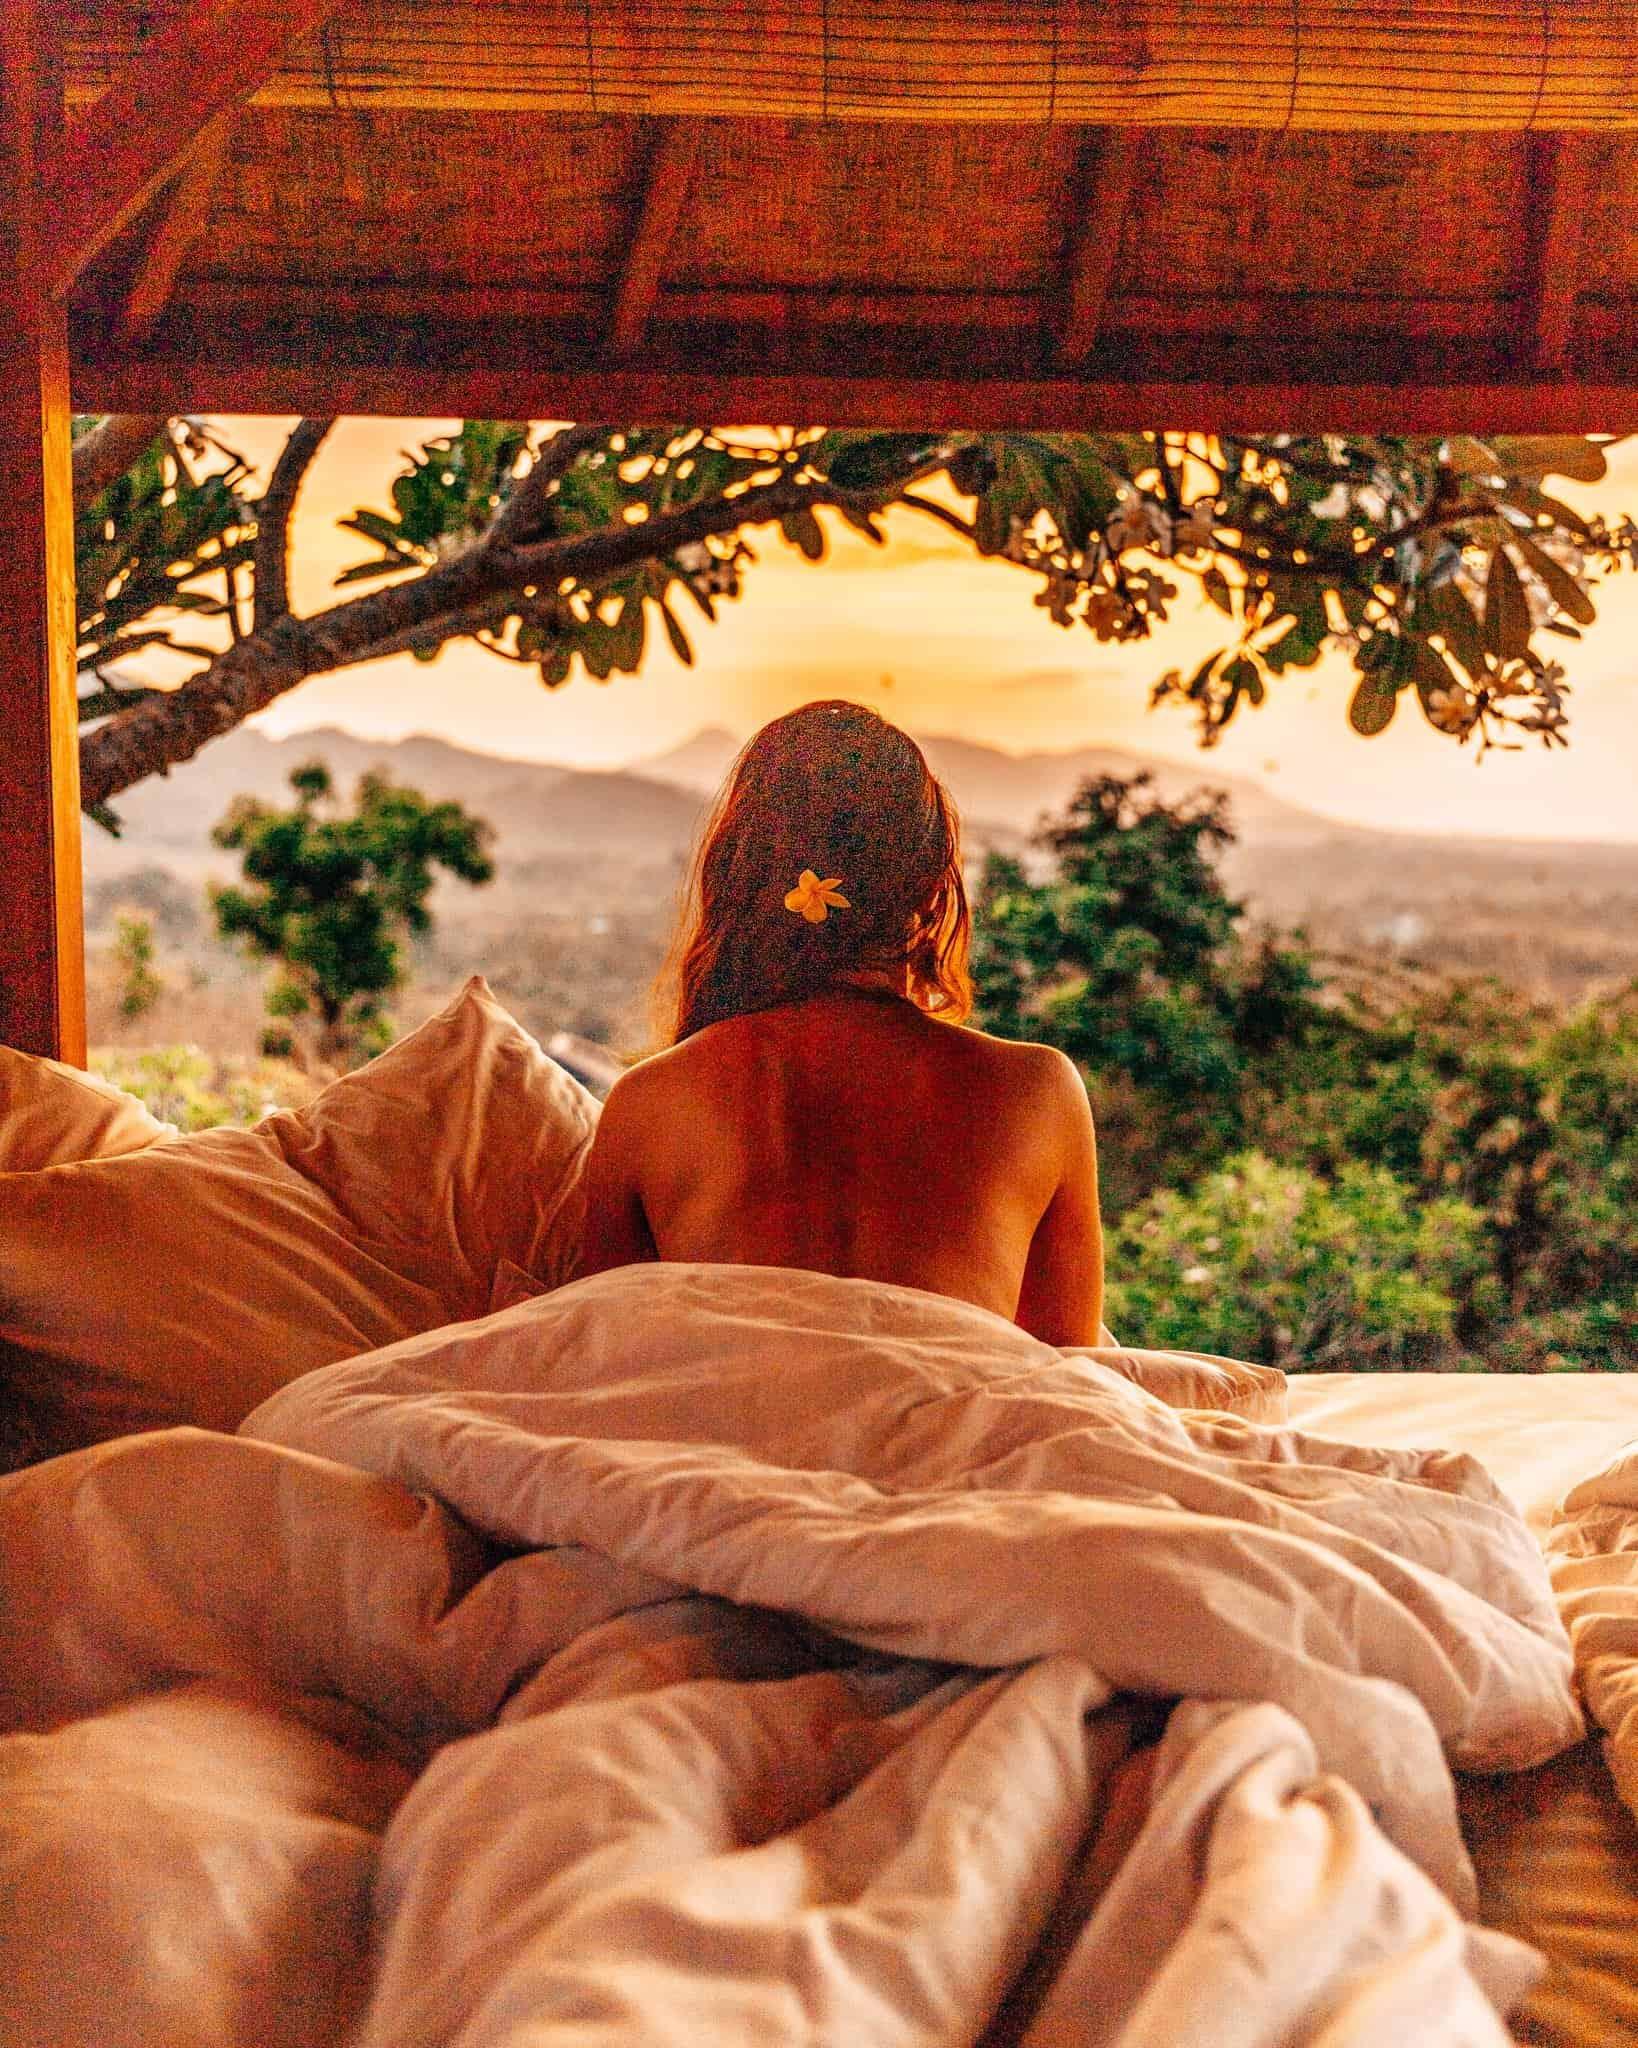 Sunset View at Sumberkima Hill, Bali - The Next Trip